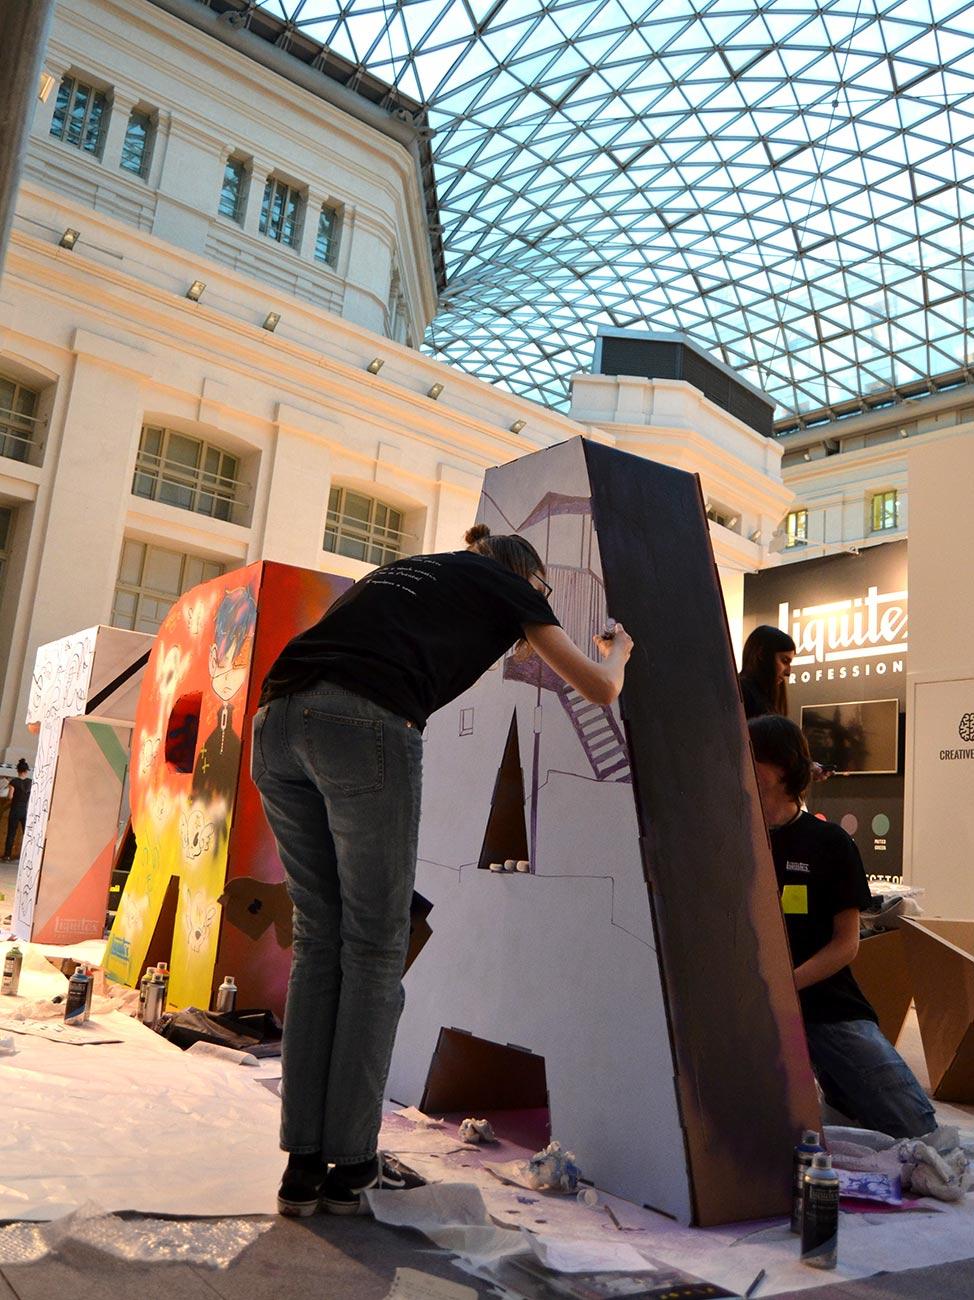 art madrid feria arte letras mobiliario carton corporeos gigantes ied madrid